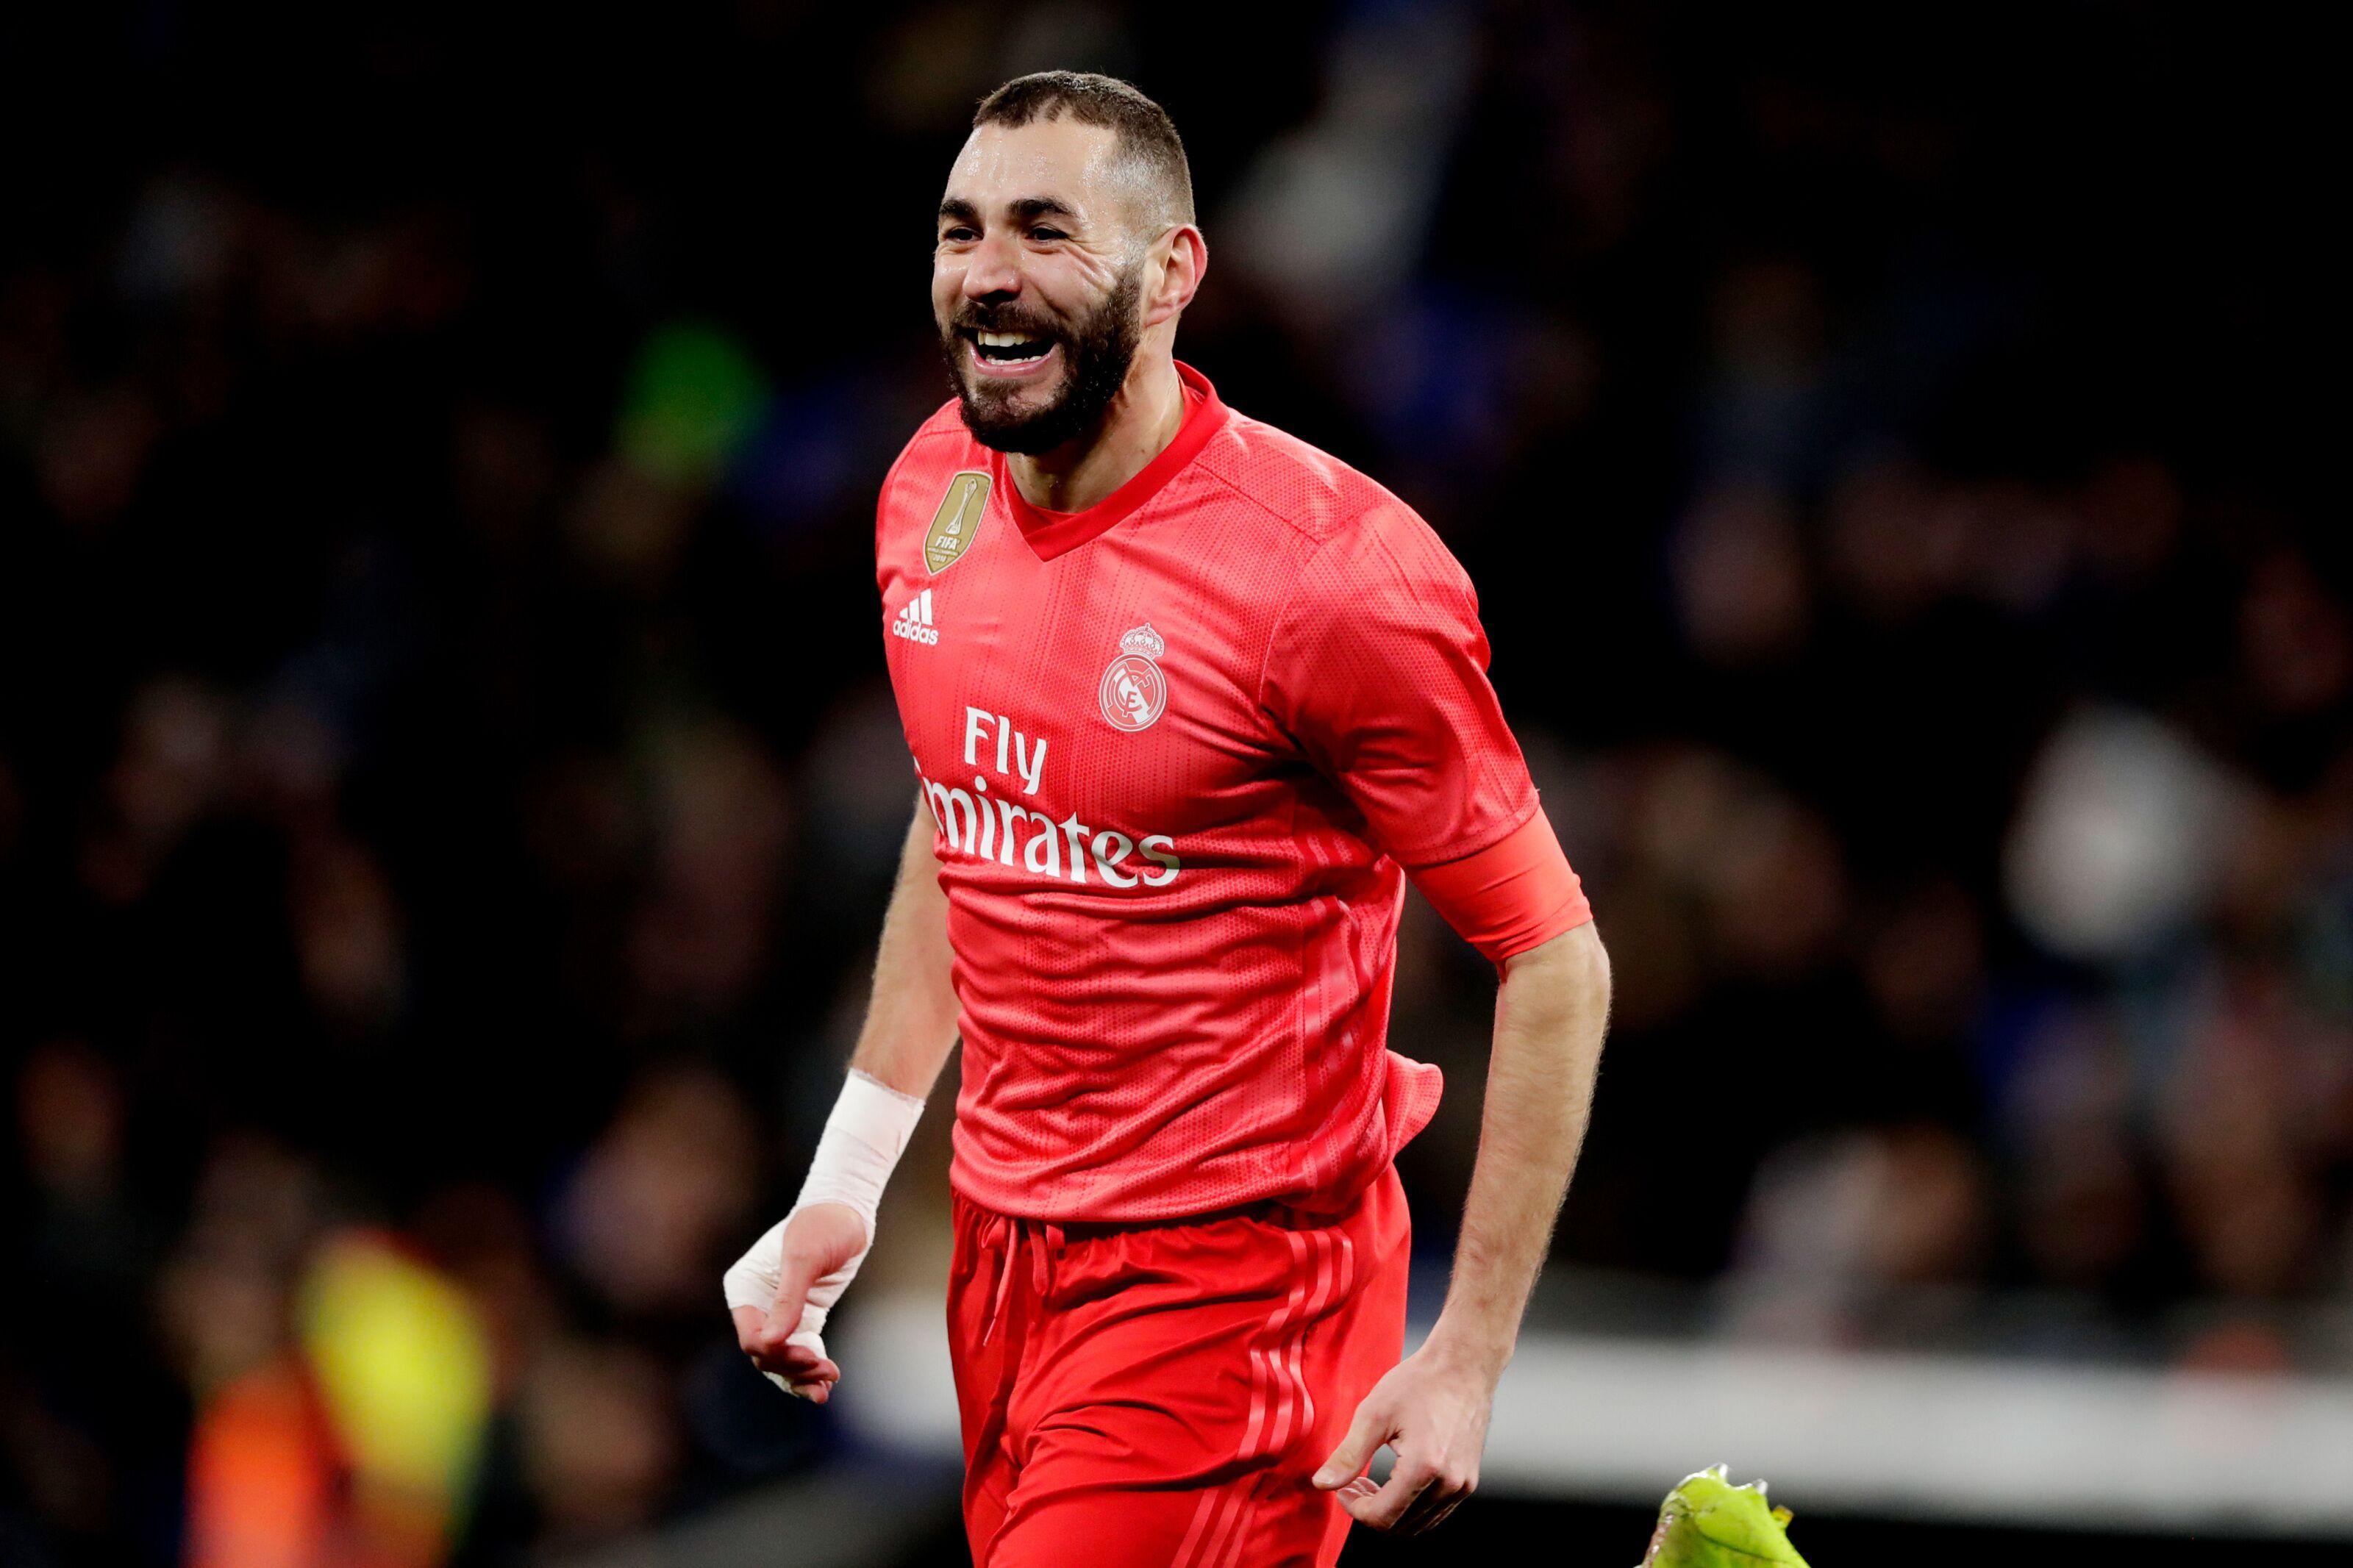 e0306abf0 Real Madrid  Karim Benzema has proved us wrong